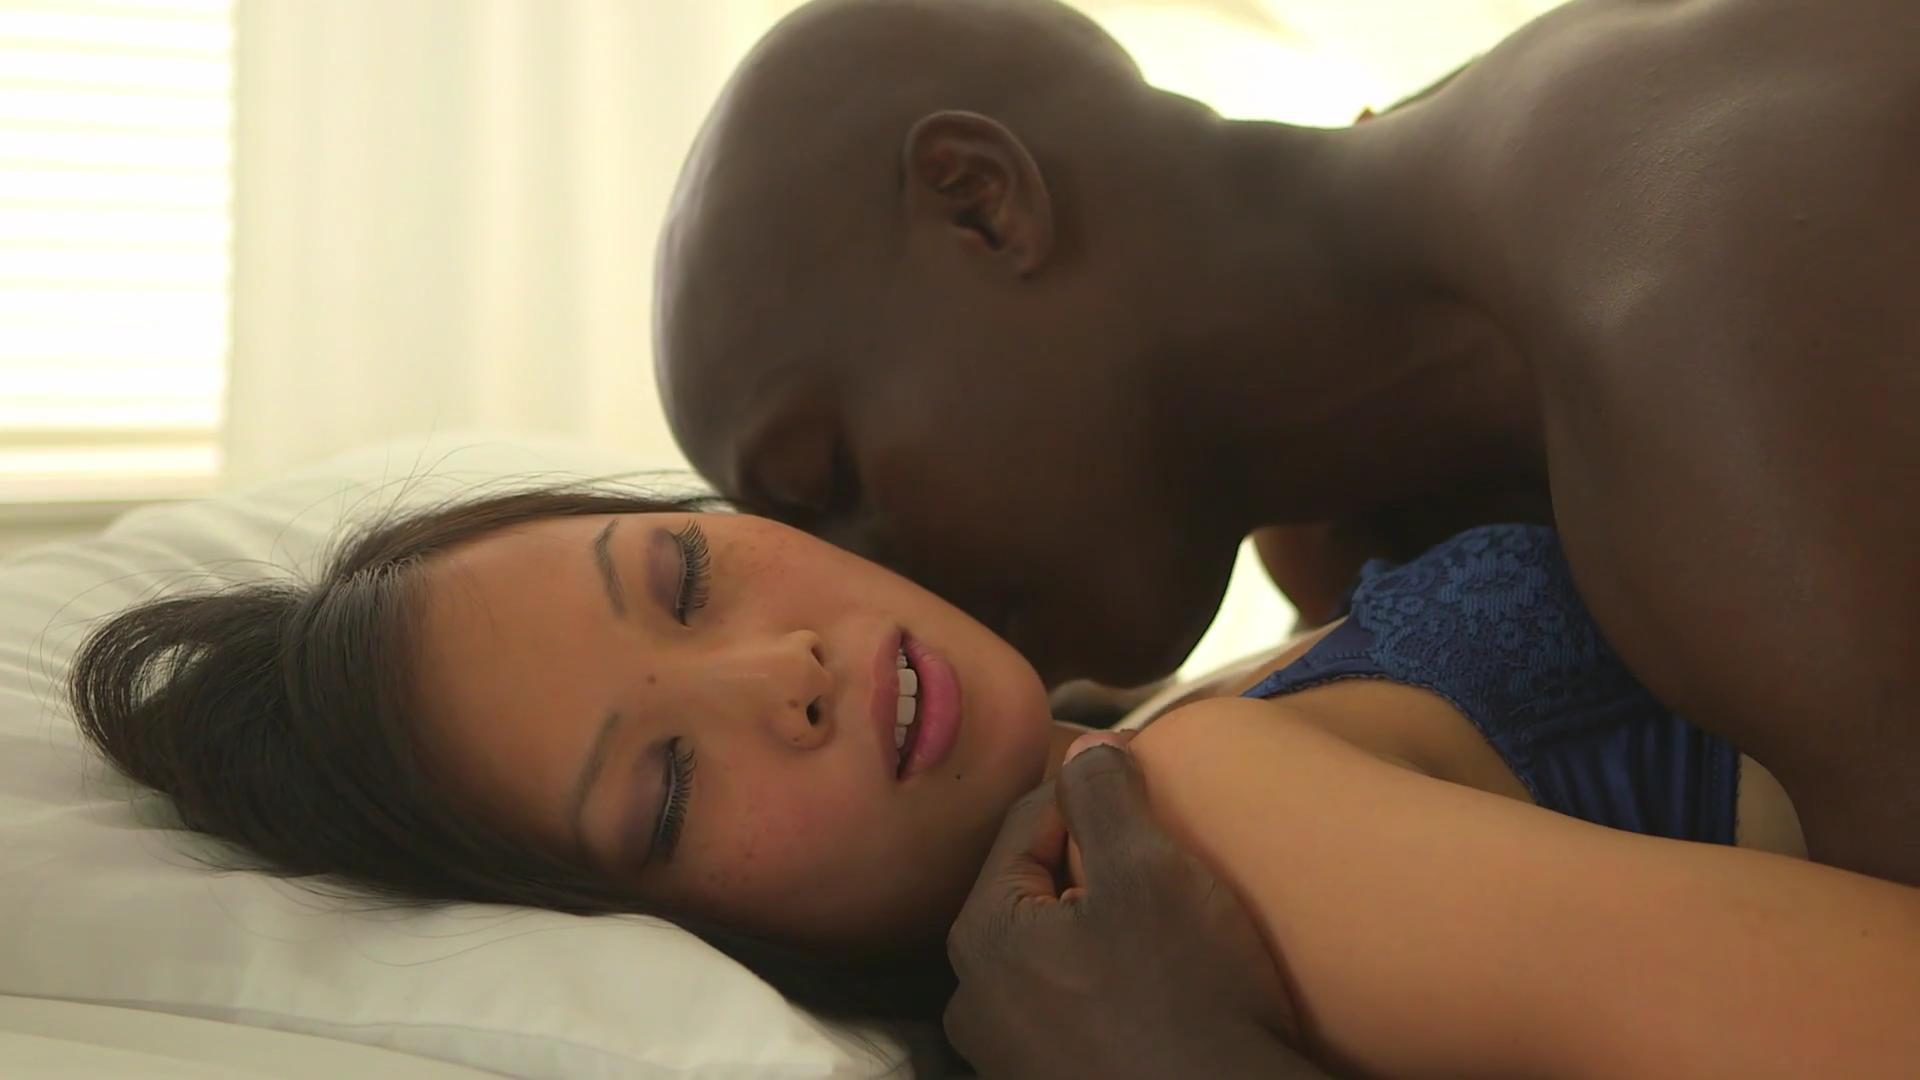 Beyond black family interracial marriage portrait white